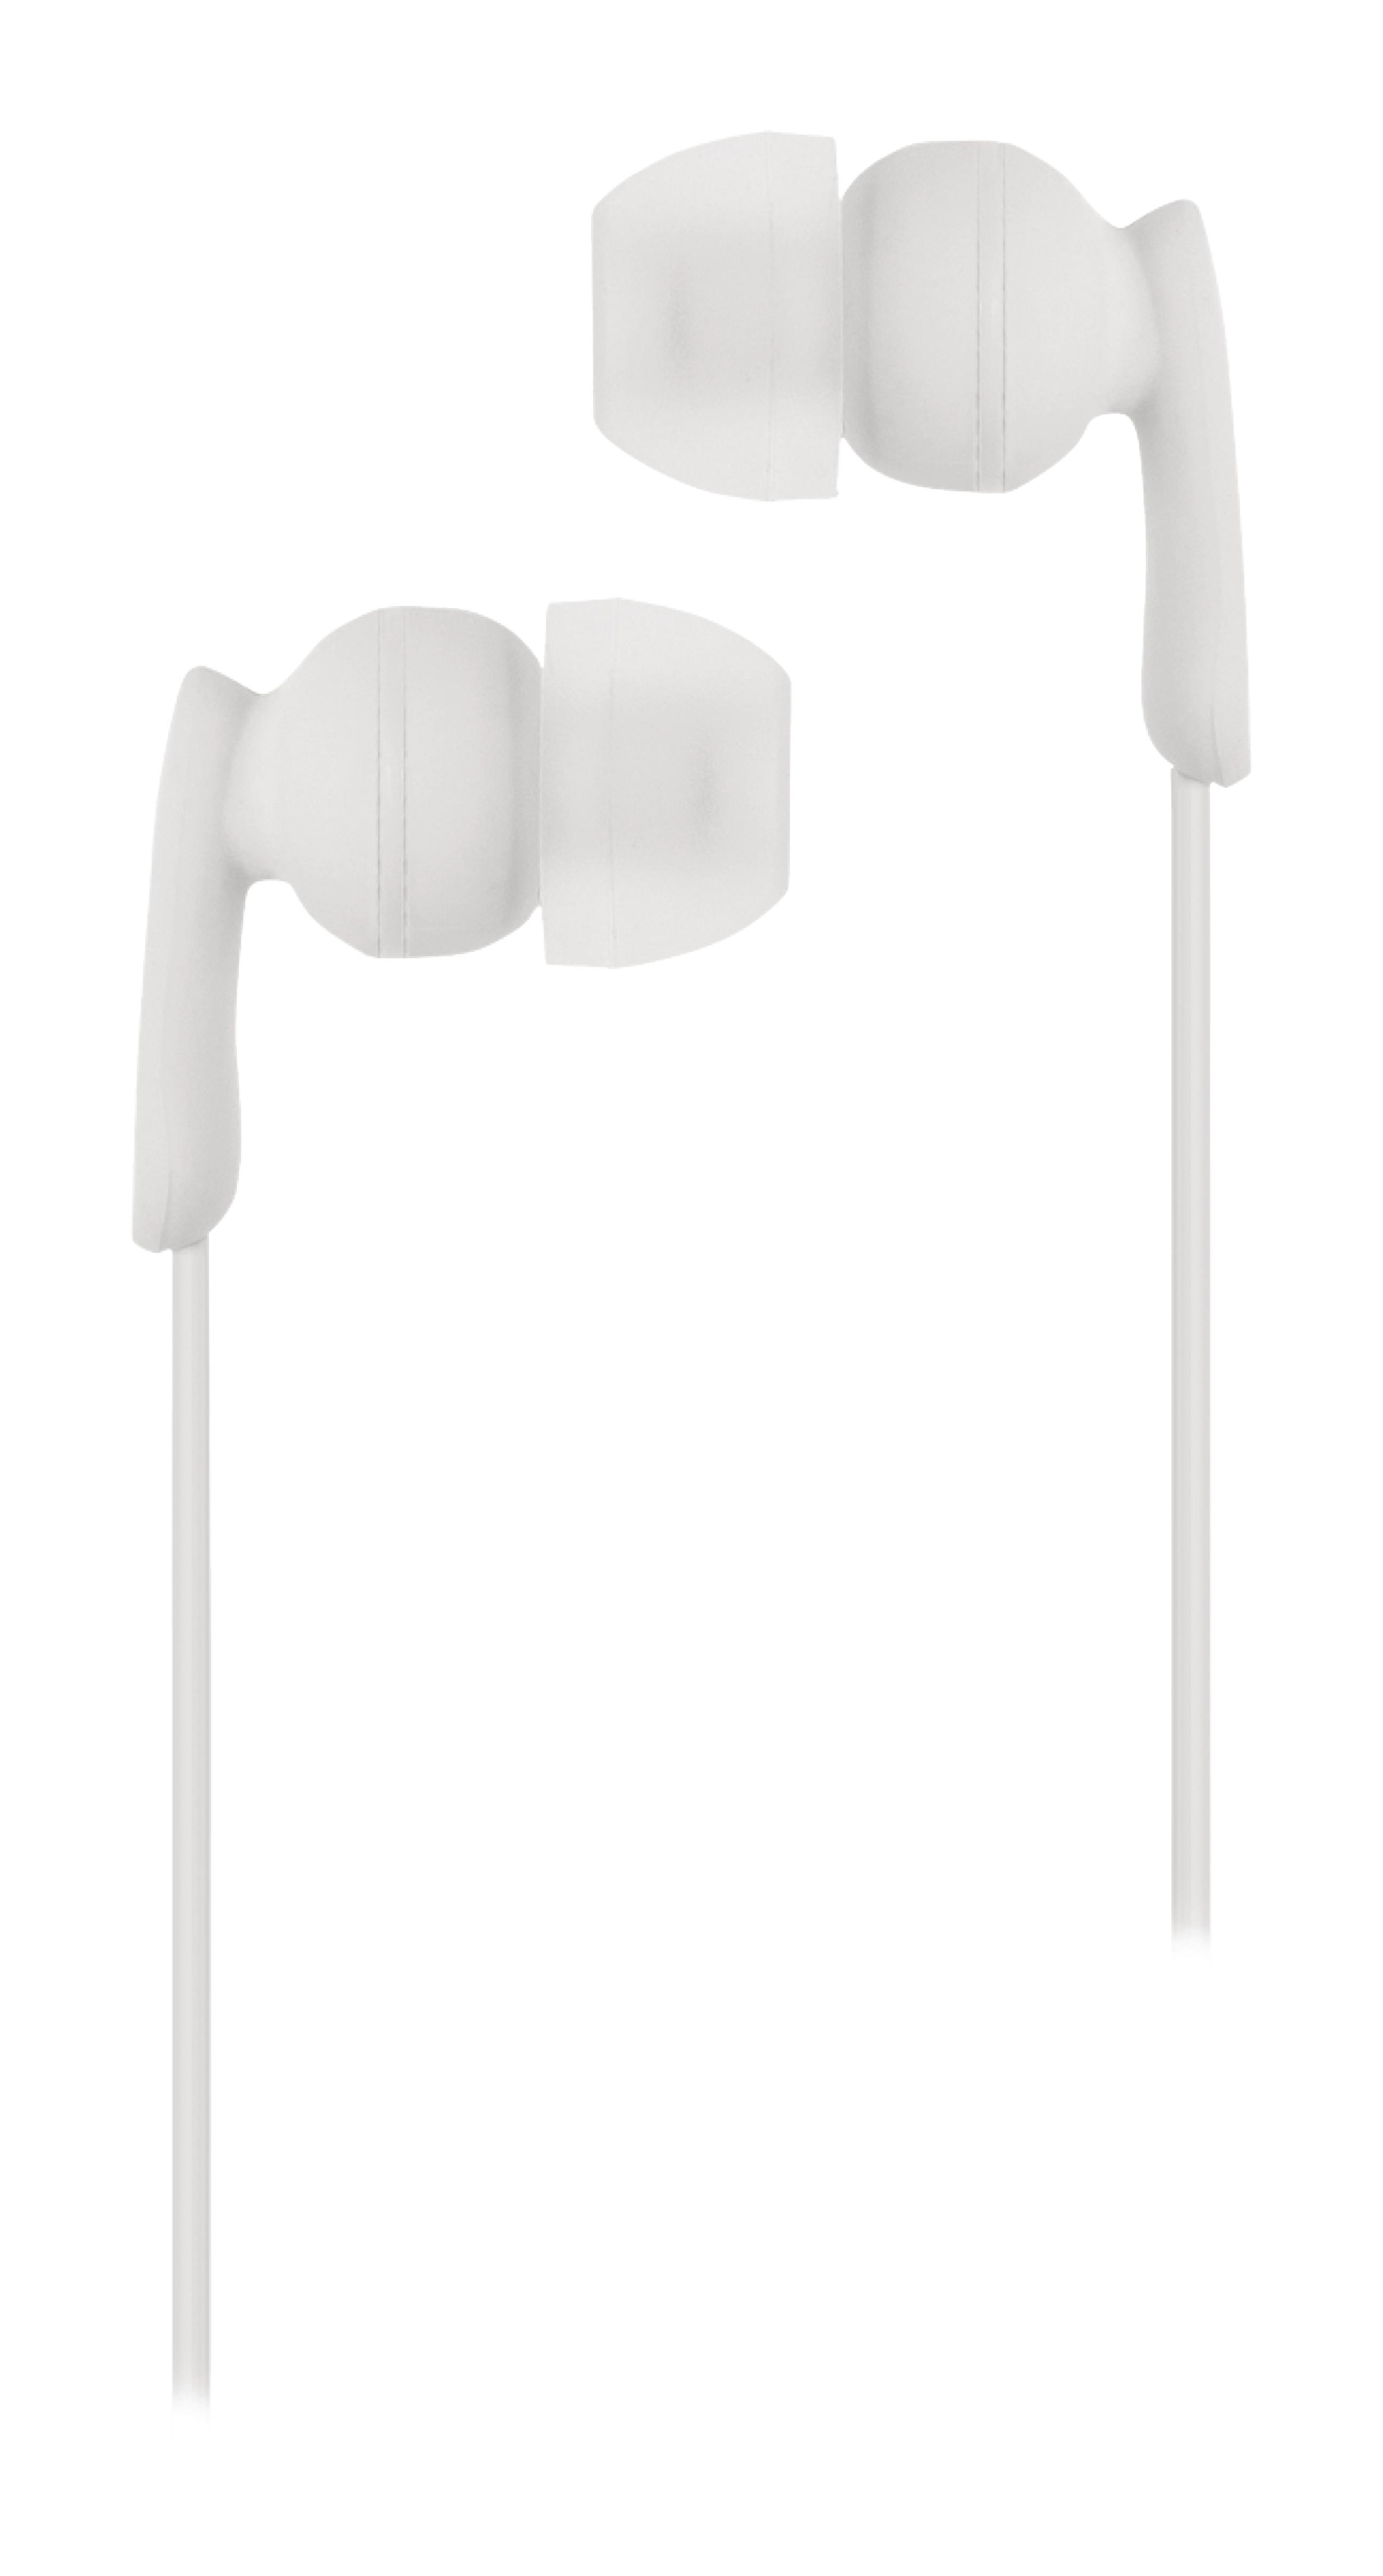 Sluchátka do uší s mikrofonem bílá, König CSHSIER100WH